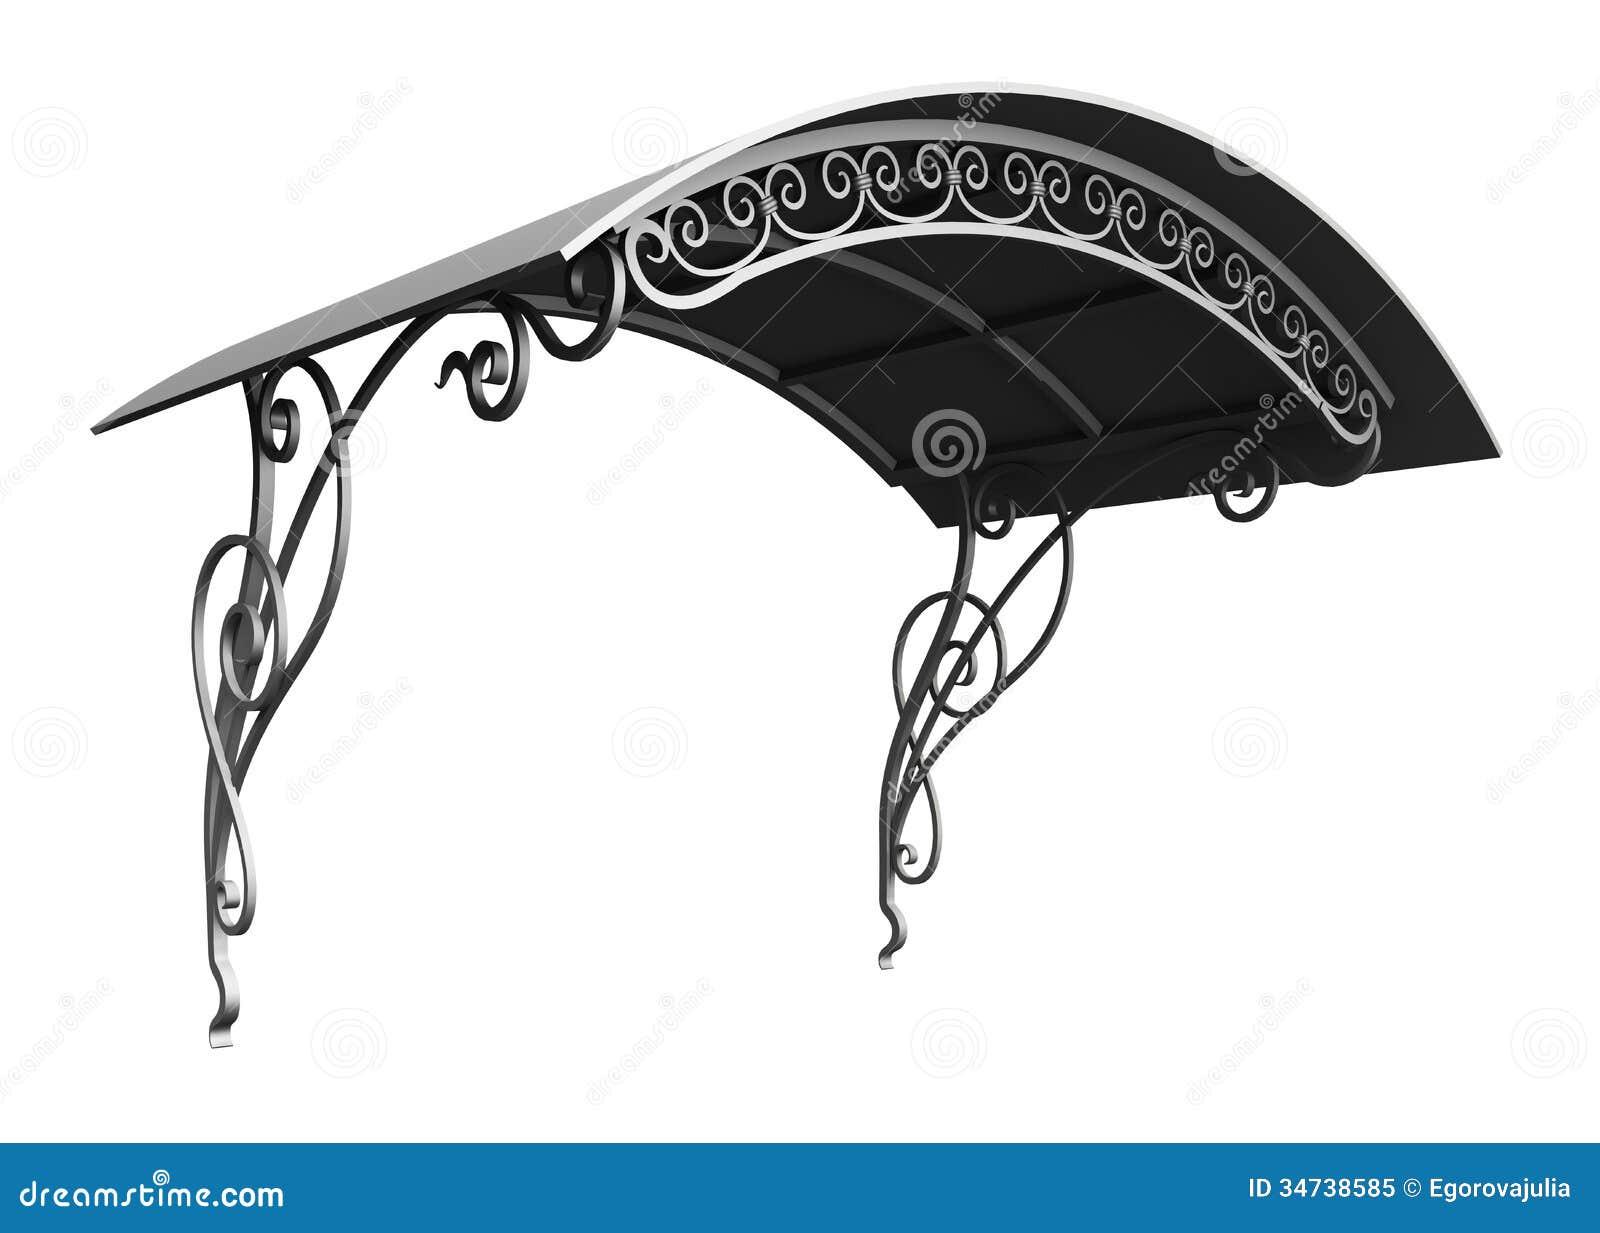 Wrought Iron Canopy Royalty Free Stock Photo Image 34738585